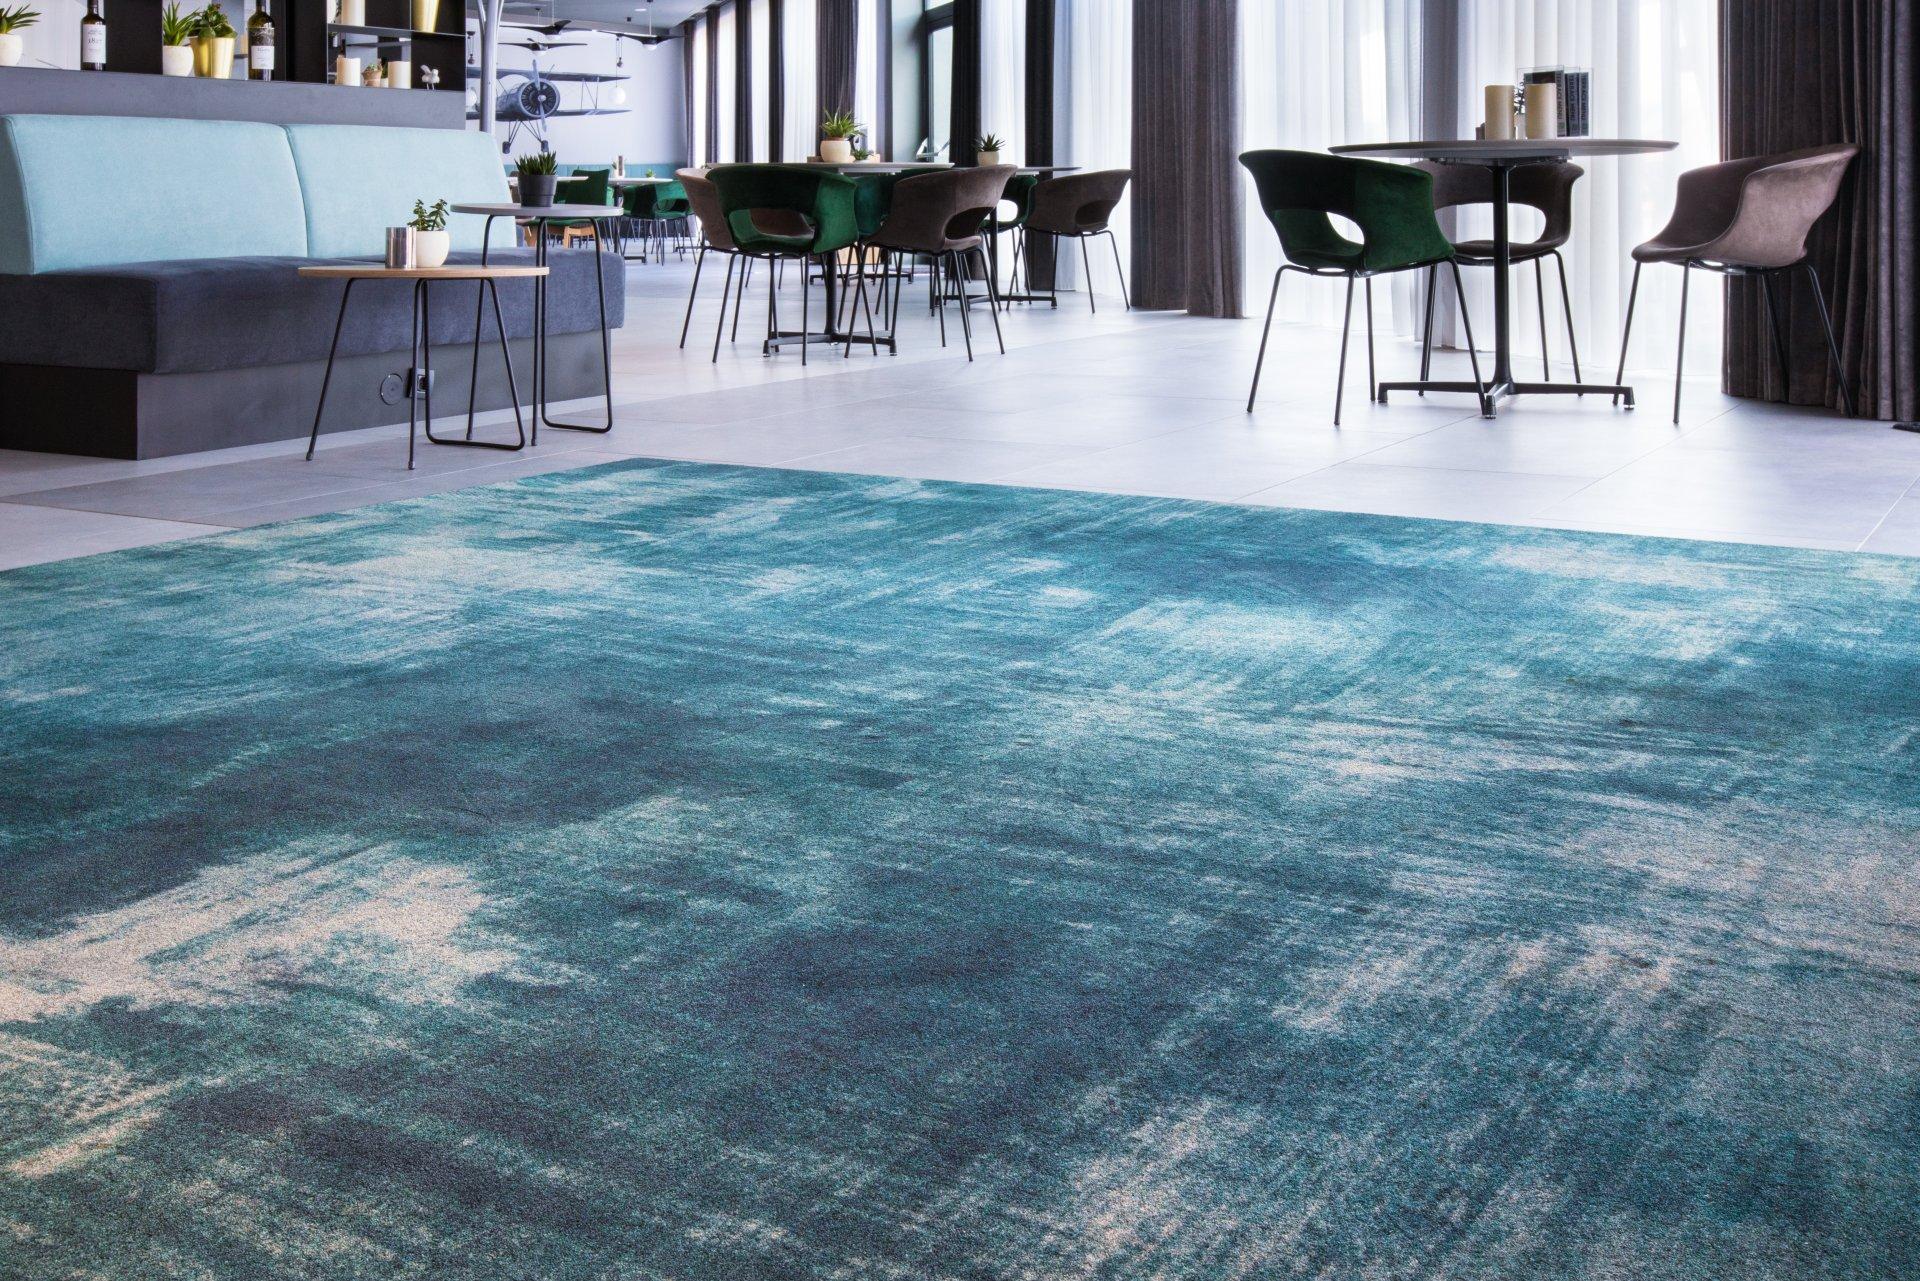 20200625-carpet-and-more-hilton-otopeni-30